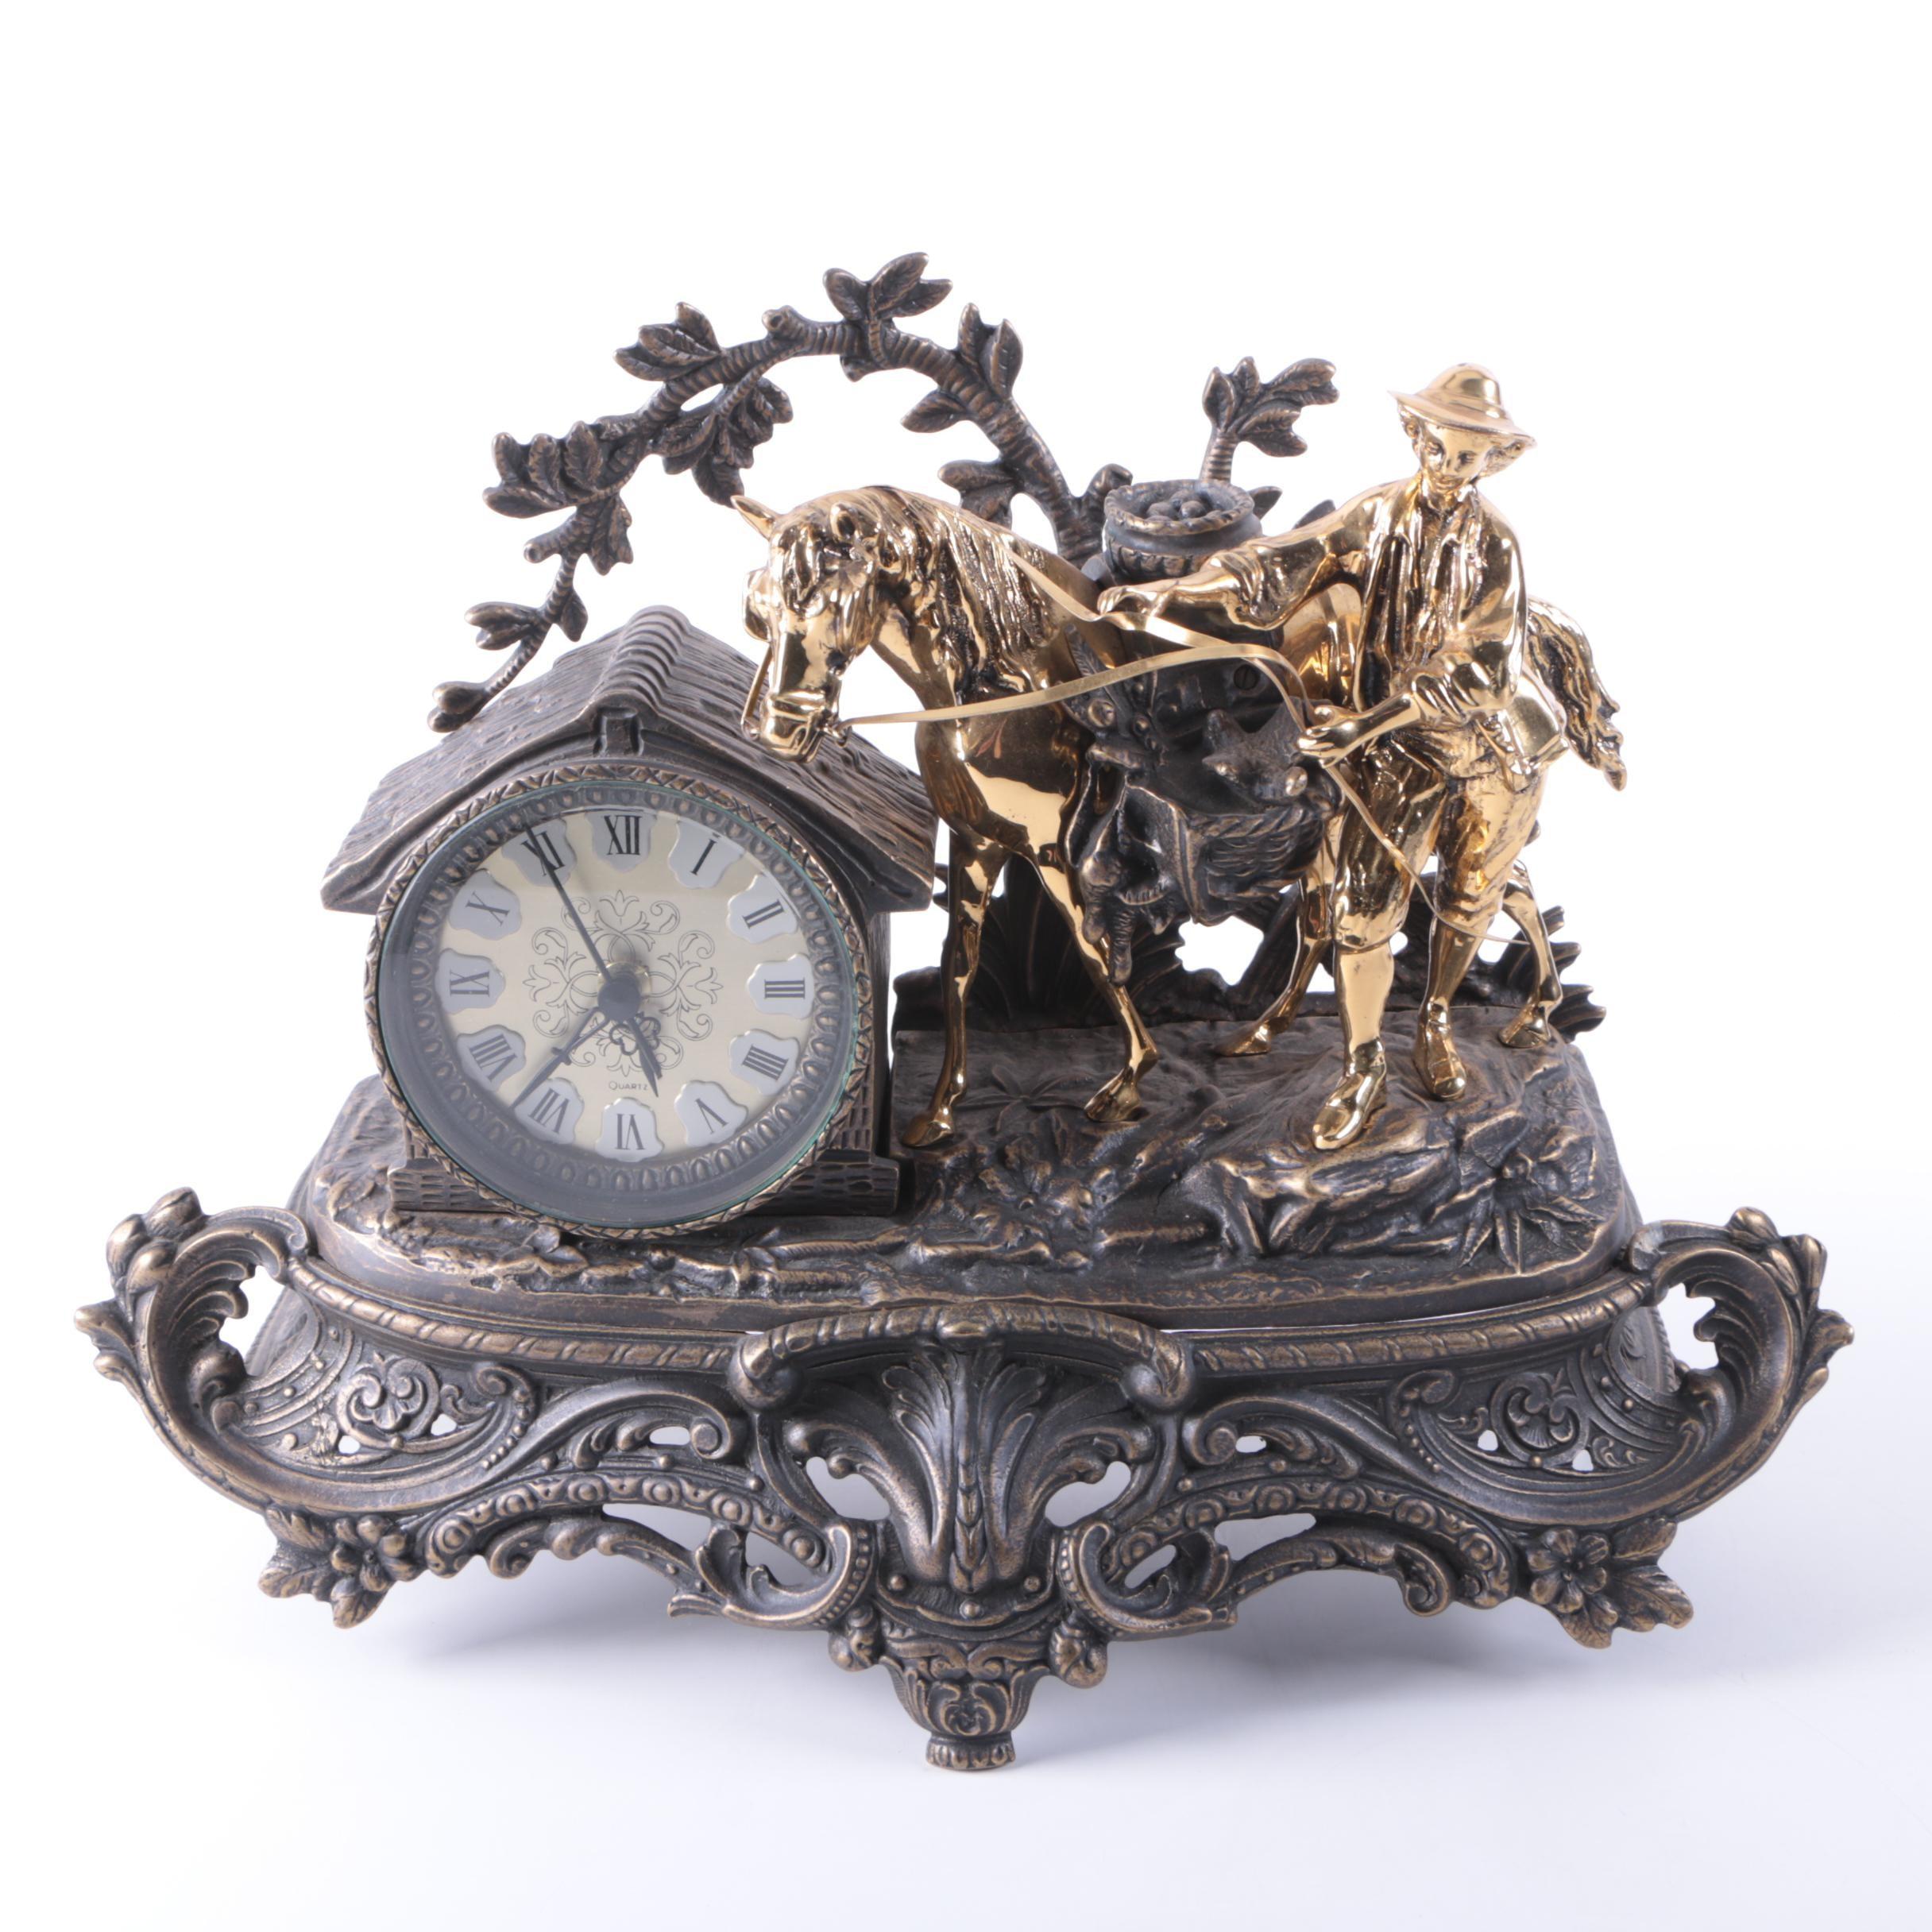 Spelter and Brass Black Forest Figural Quartz Mantel Clock